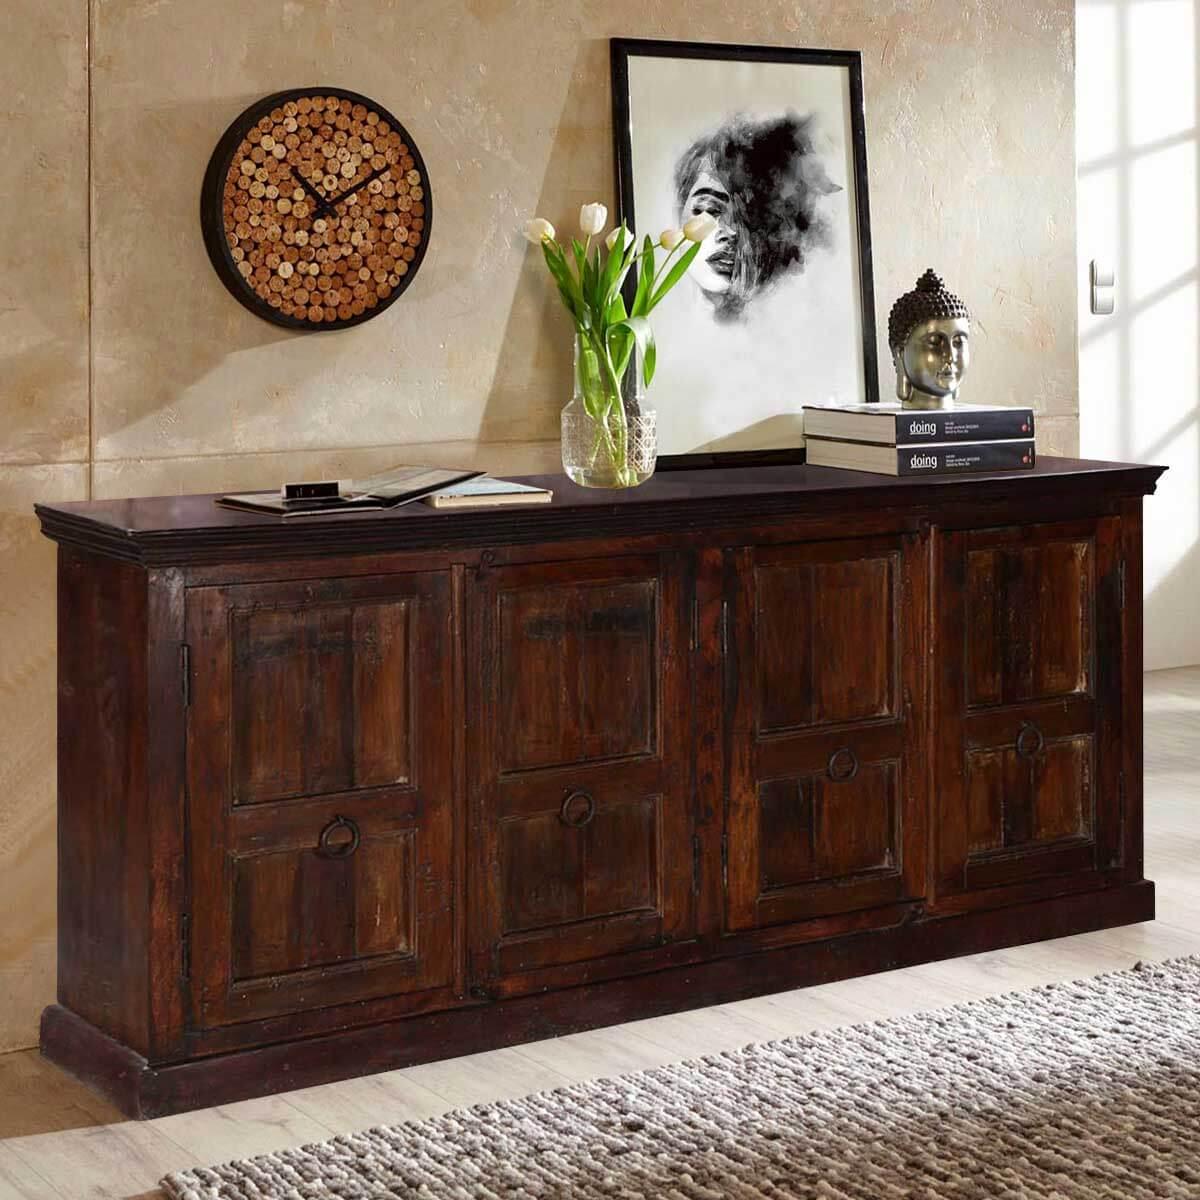 Picture of: Logan Rustic Solid Wood 4 Shelf 4 Door Extra Long Buffet Cabinet